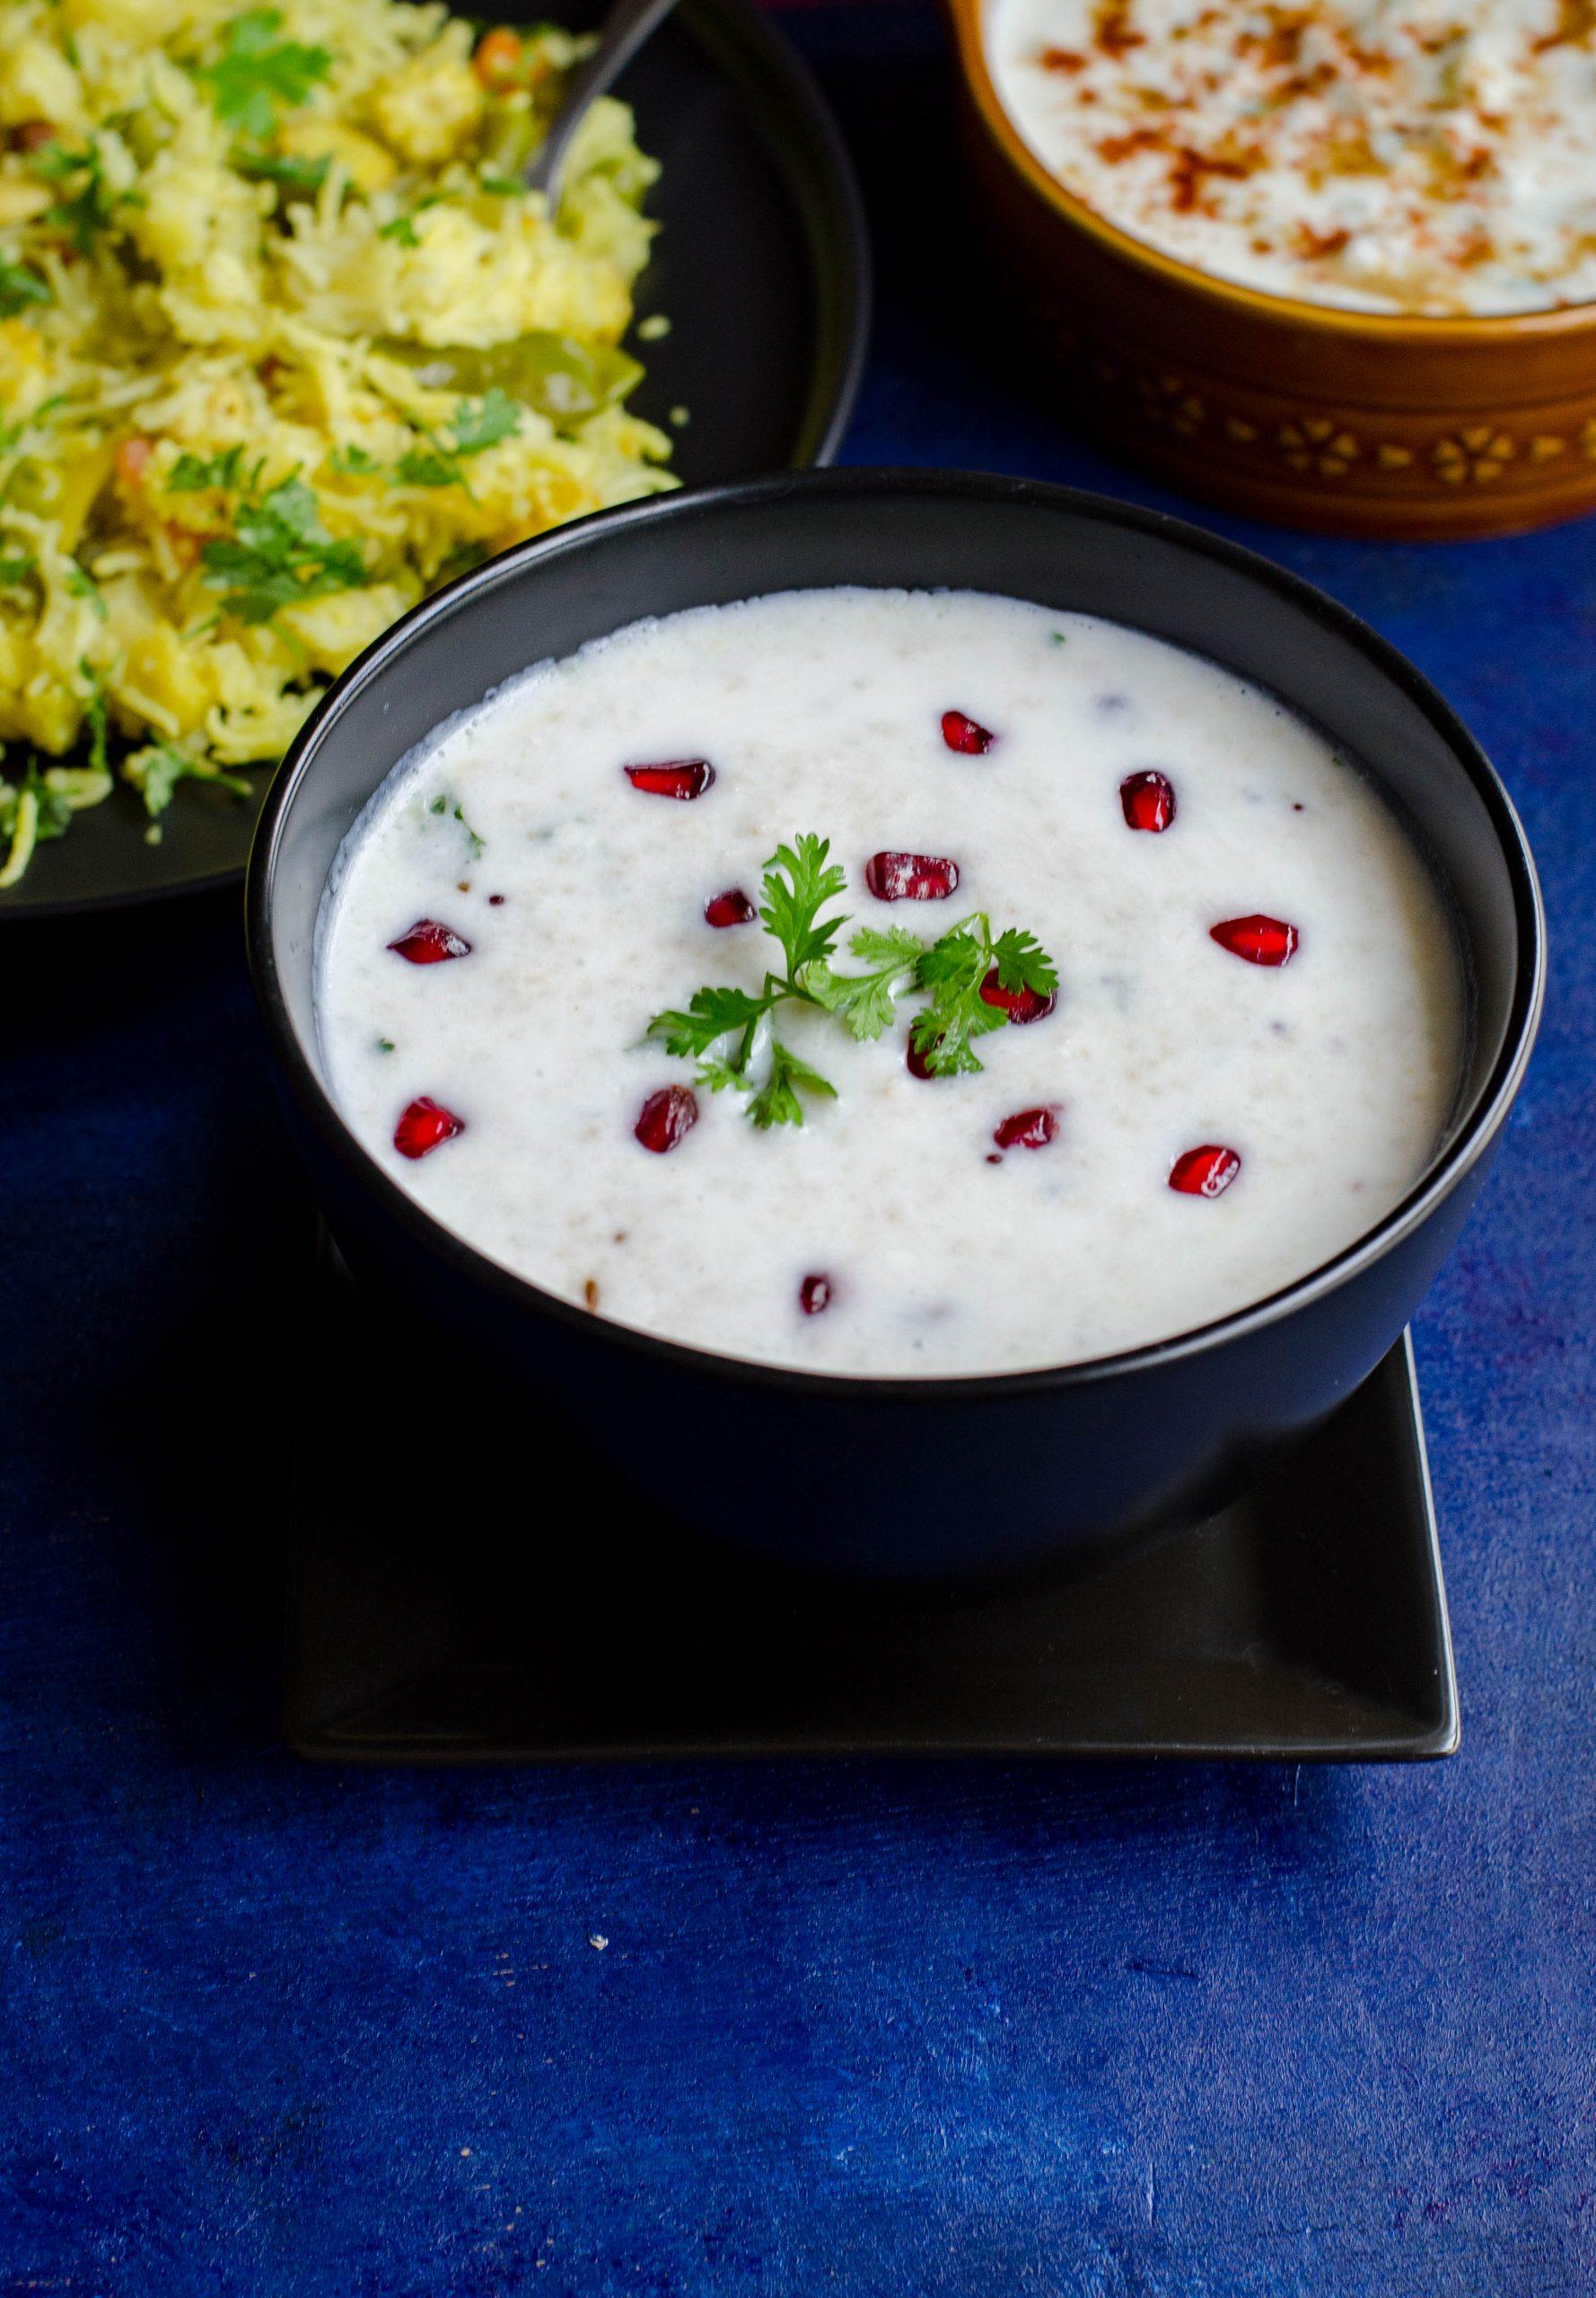 Samai Thayir Sadam served in a black bowl. Pomegranate pearls and cilantro as garnish.